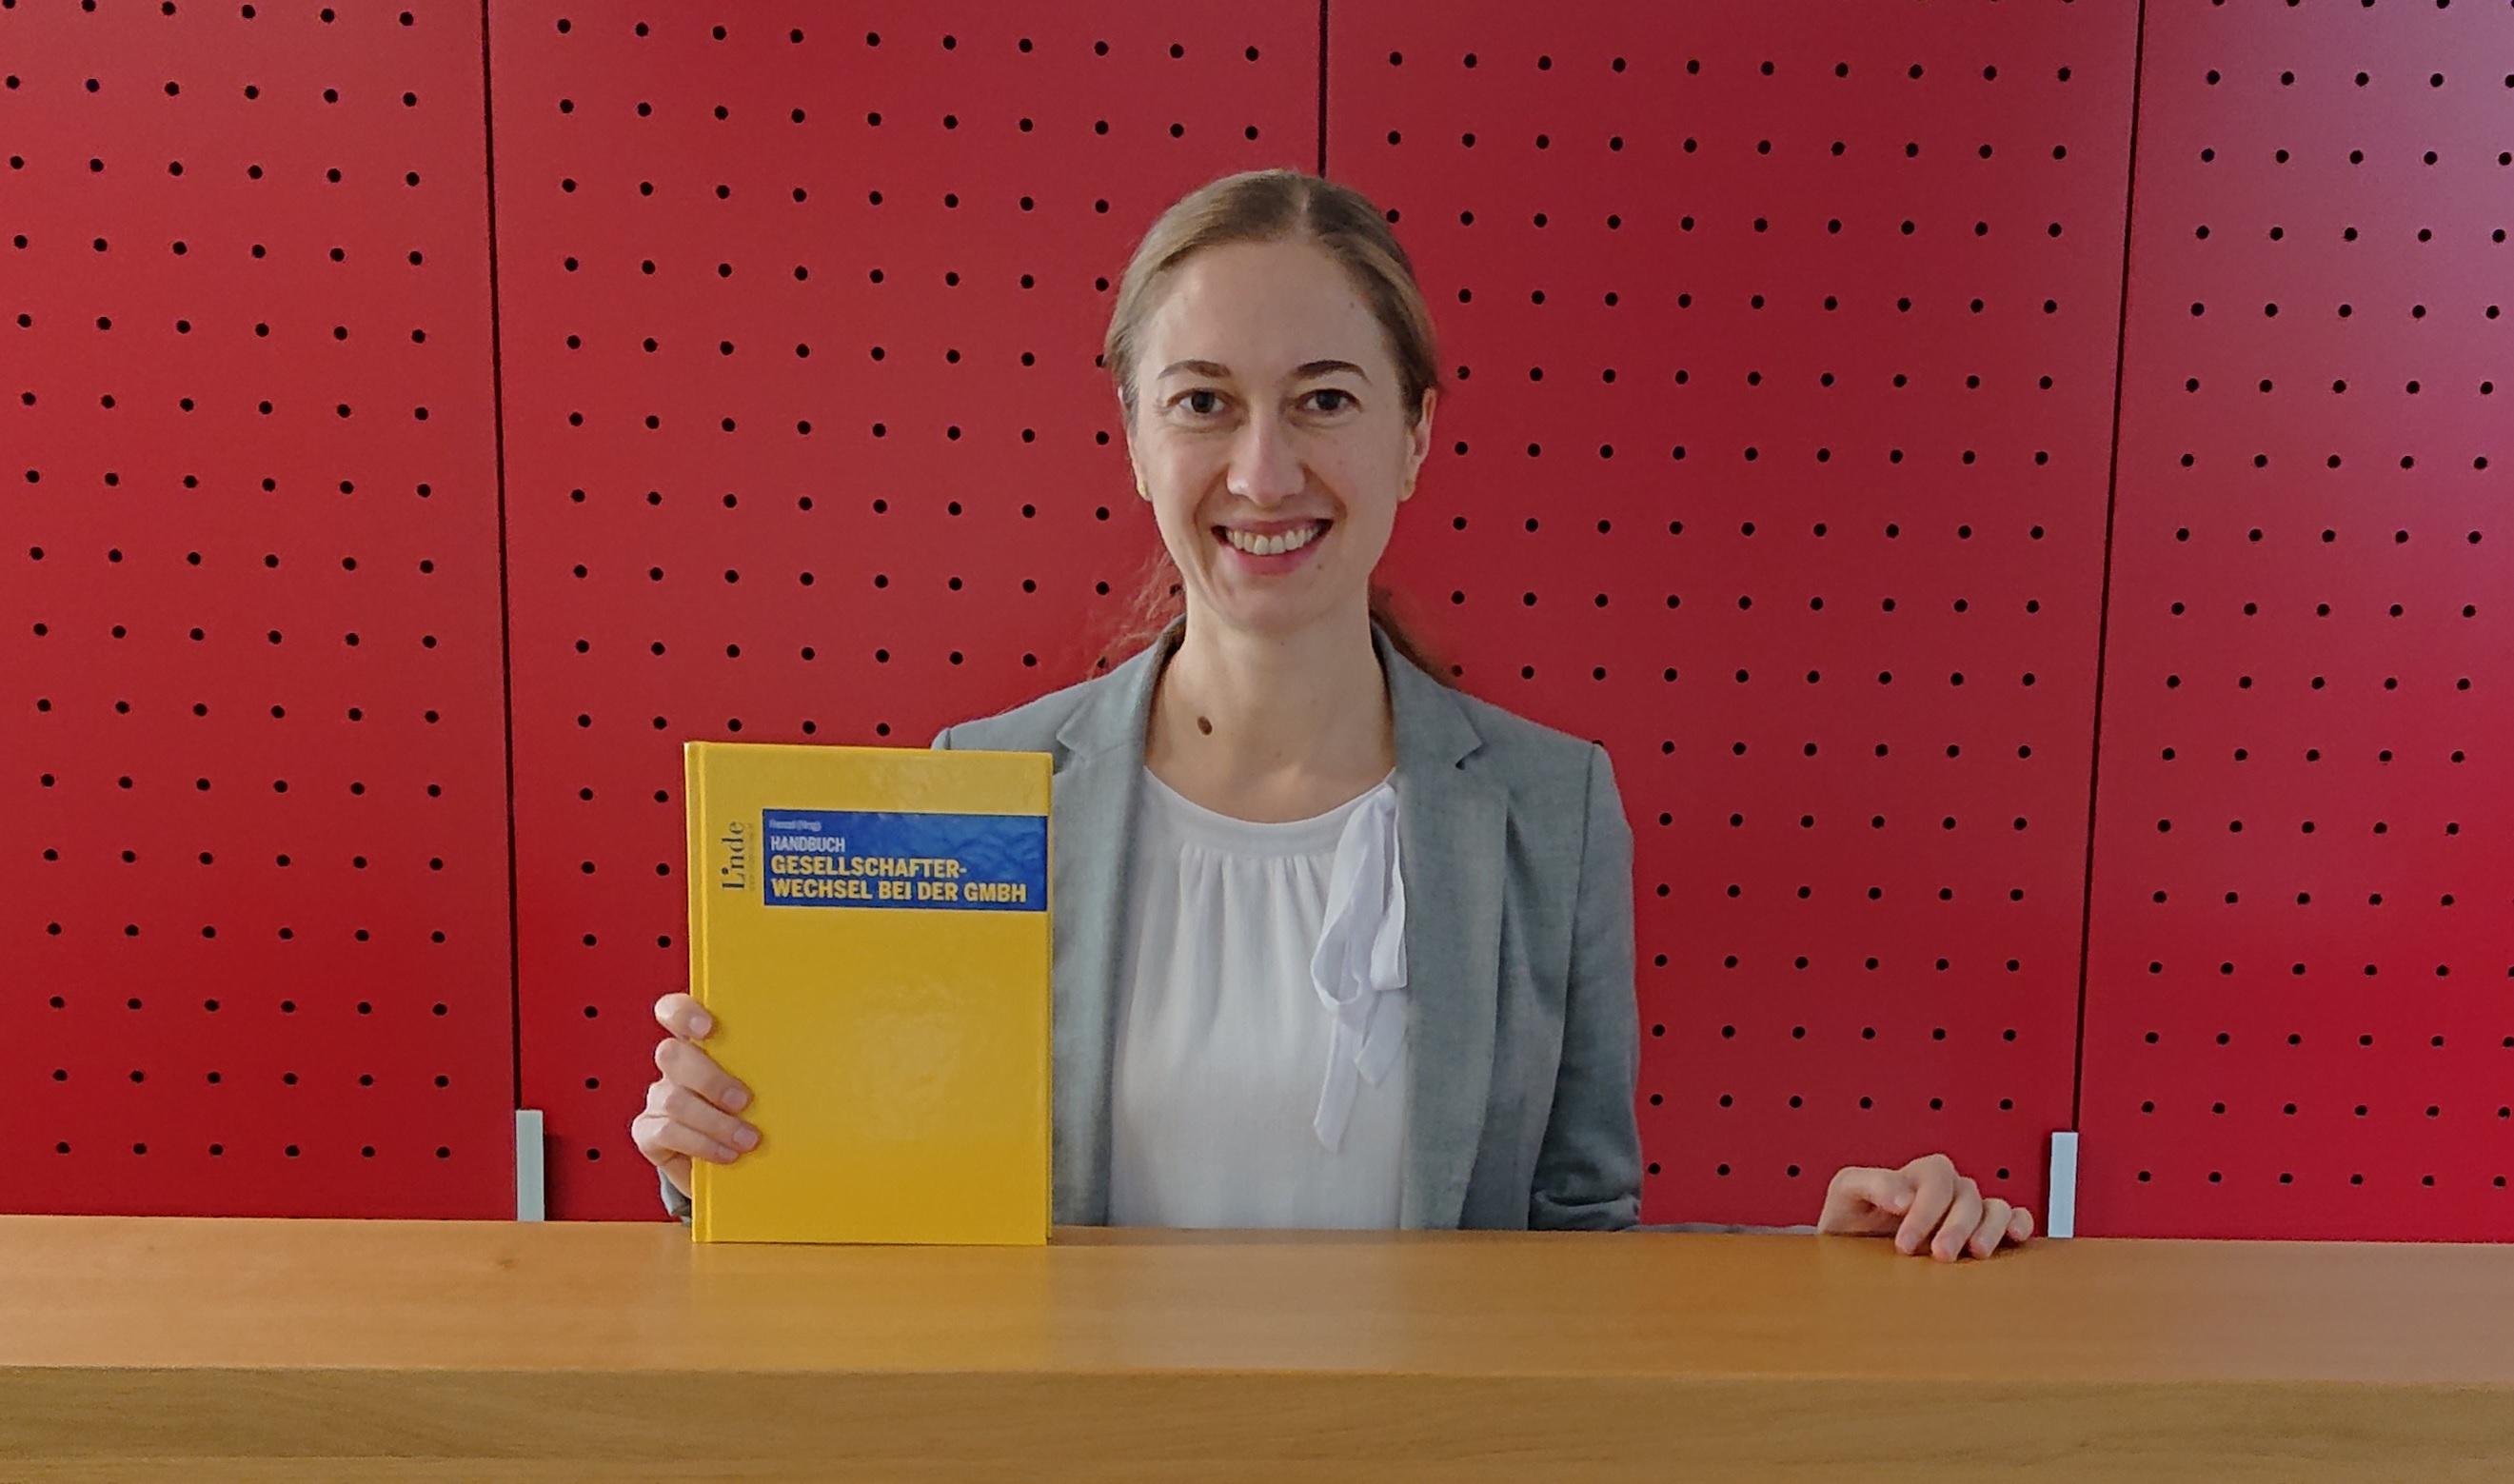 Theresa Haglmüller_Gesellschafterwechsel bei der GmbH